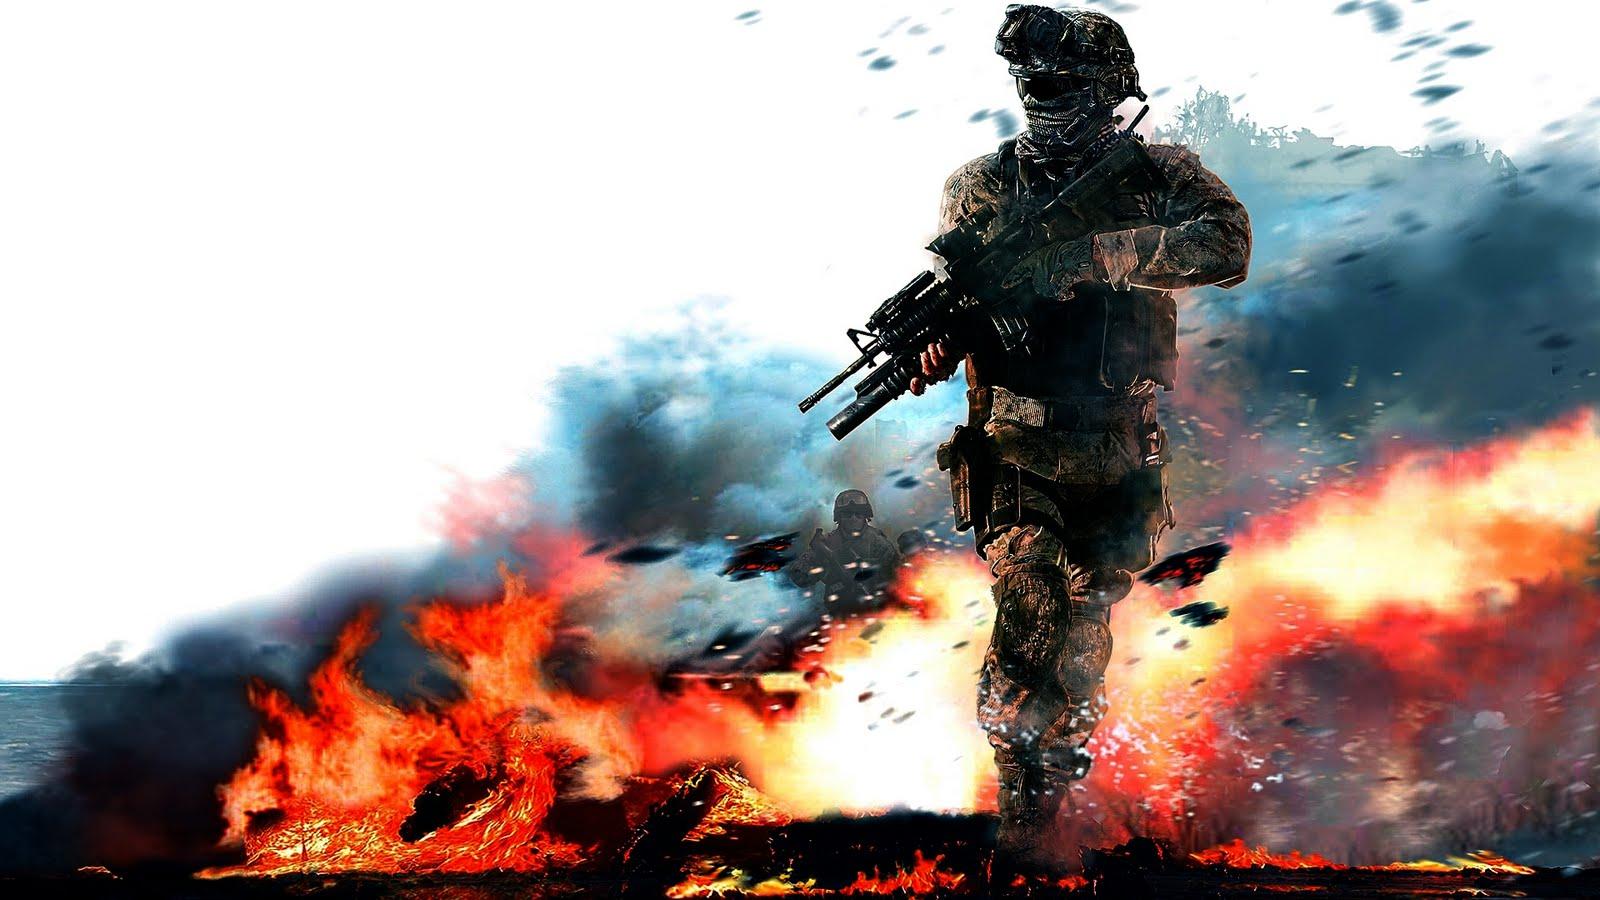 Call Of Duty Wallpaper Hd: HD WALLPAPERS: Call Of Duty Modren Warfare 2 Hd Wallpapers